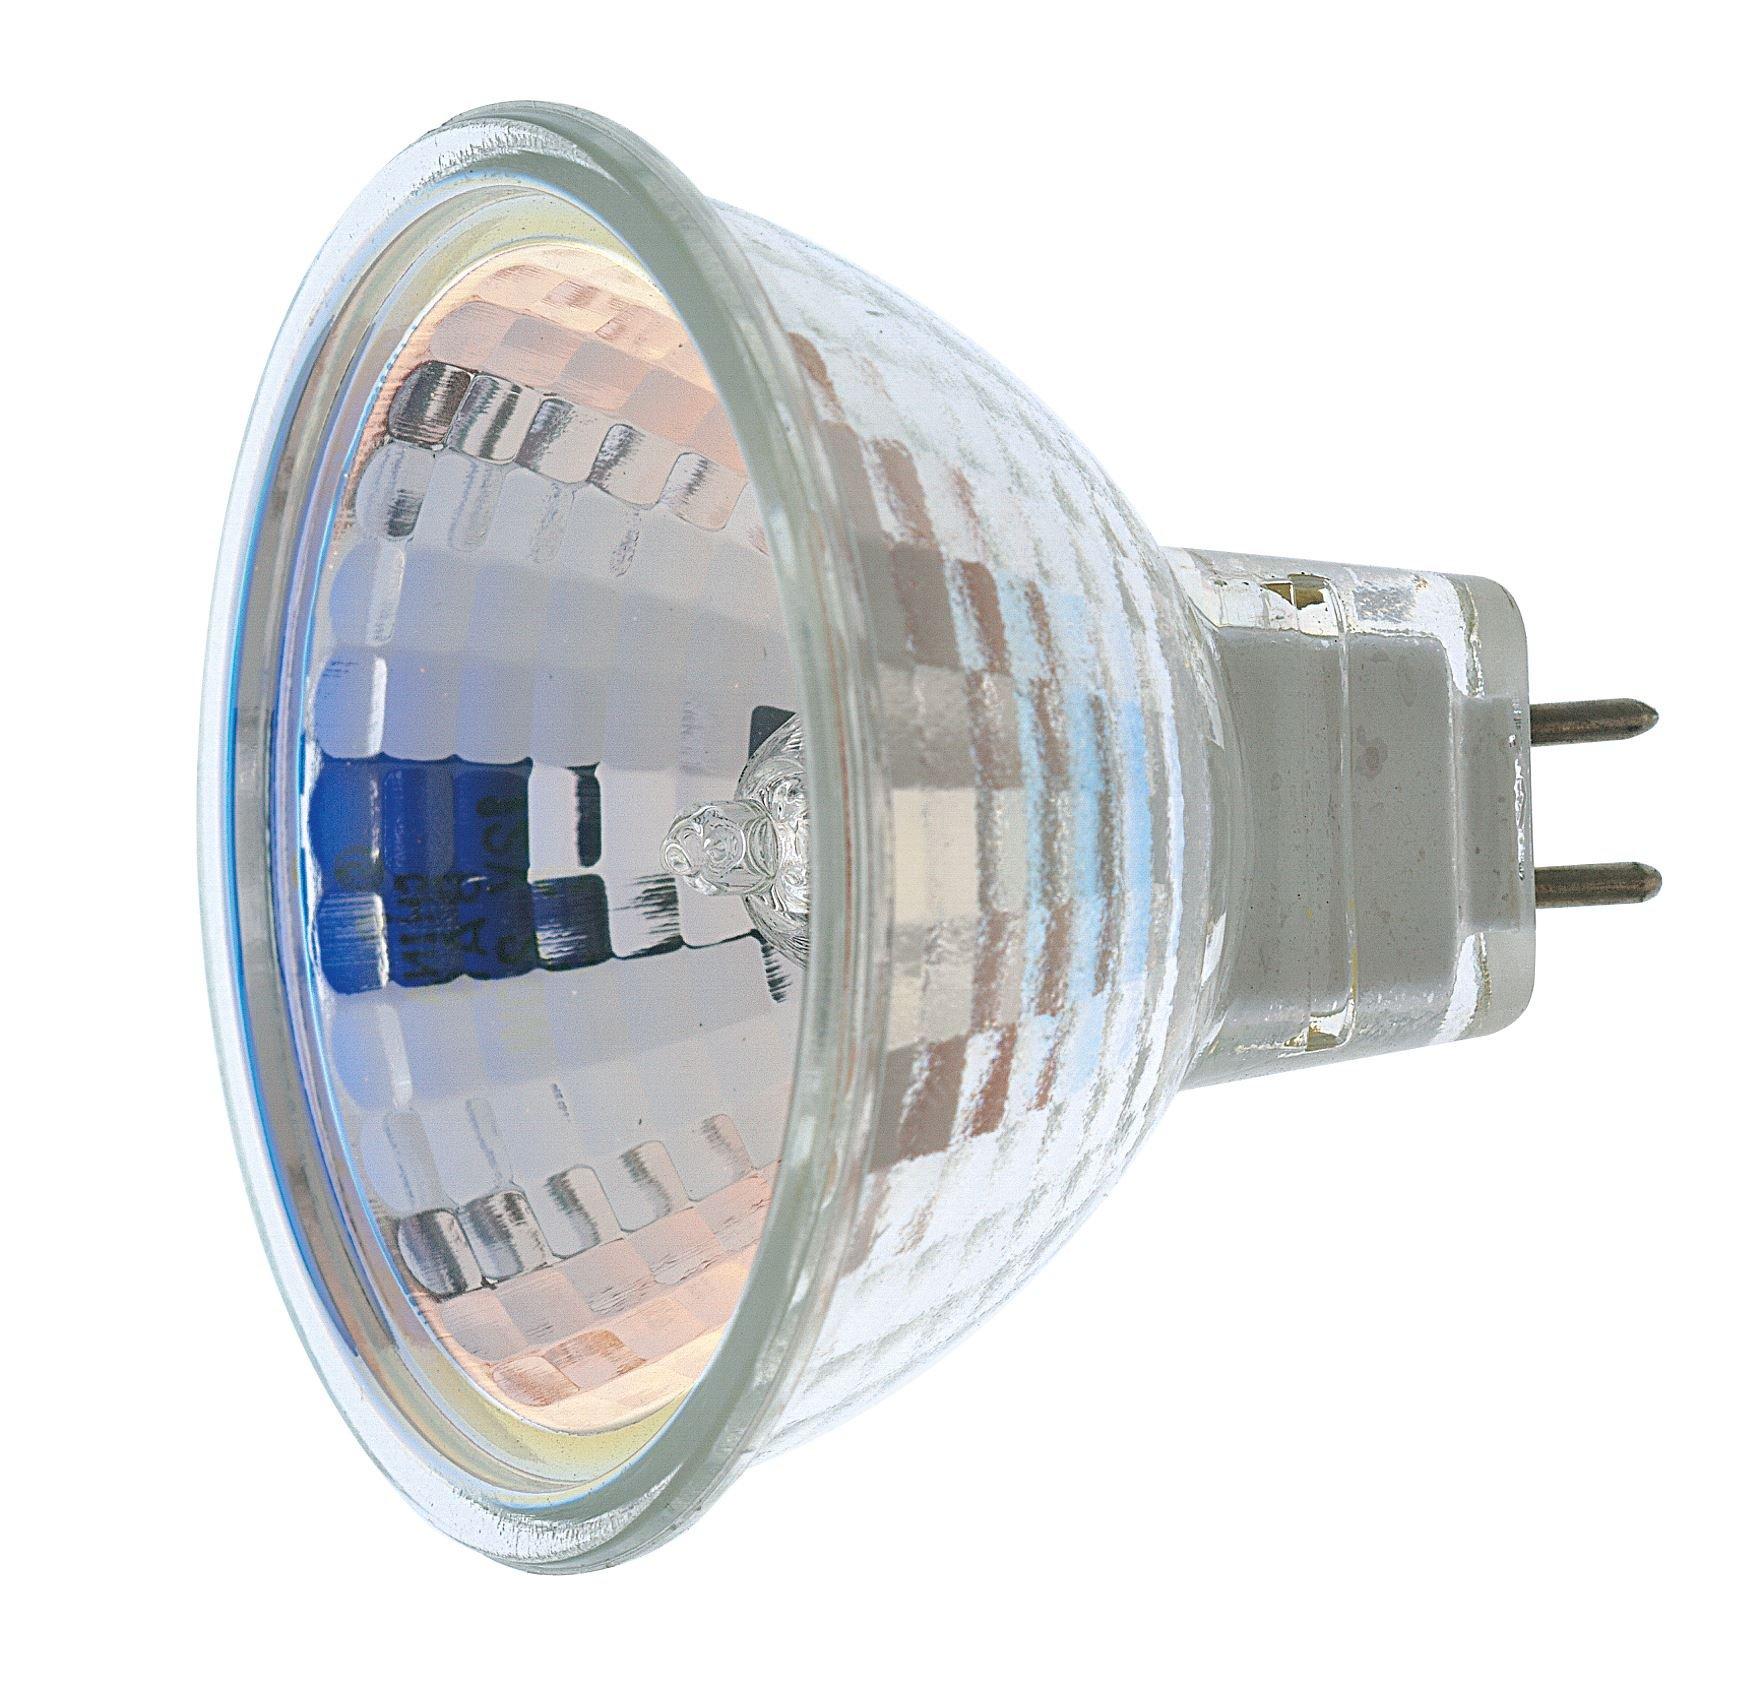 Satco 35MR16/FL Halogen MR Halogen, 35W GU5.3/GX5.3 MR16, Bulb [Pack of 24]